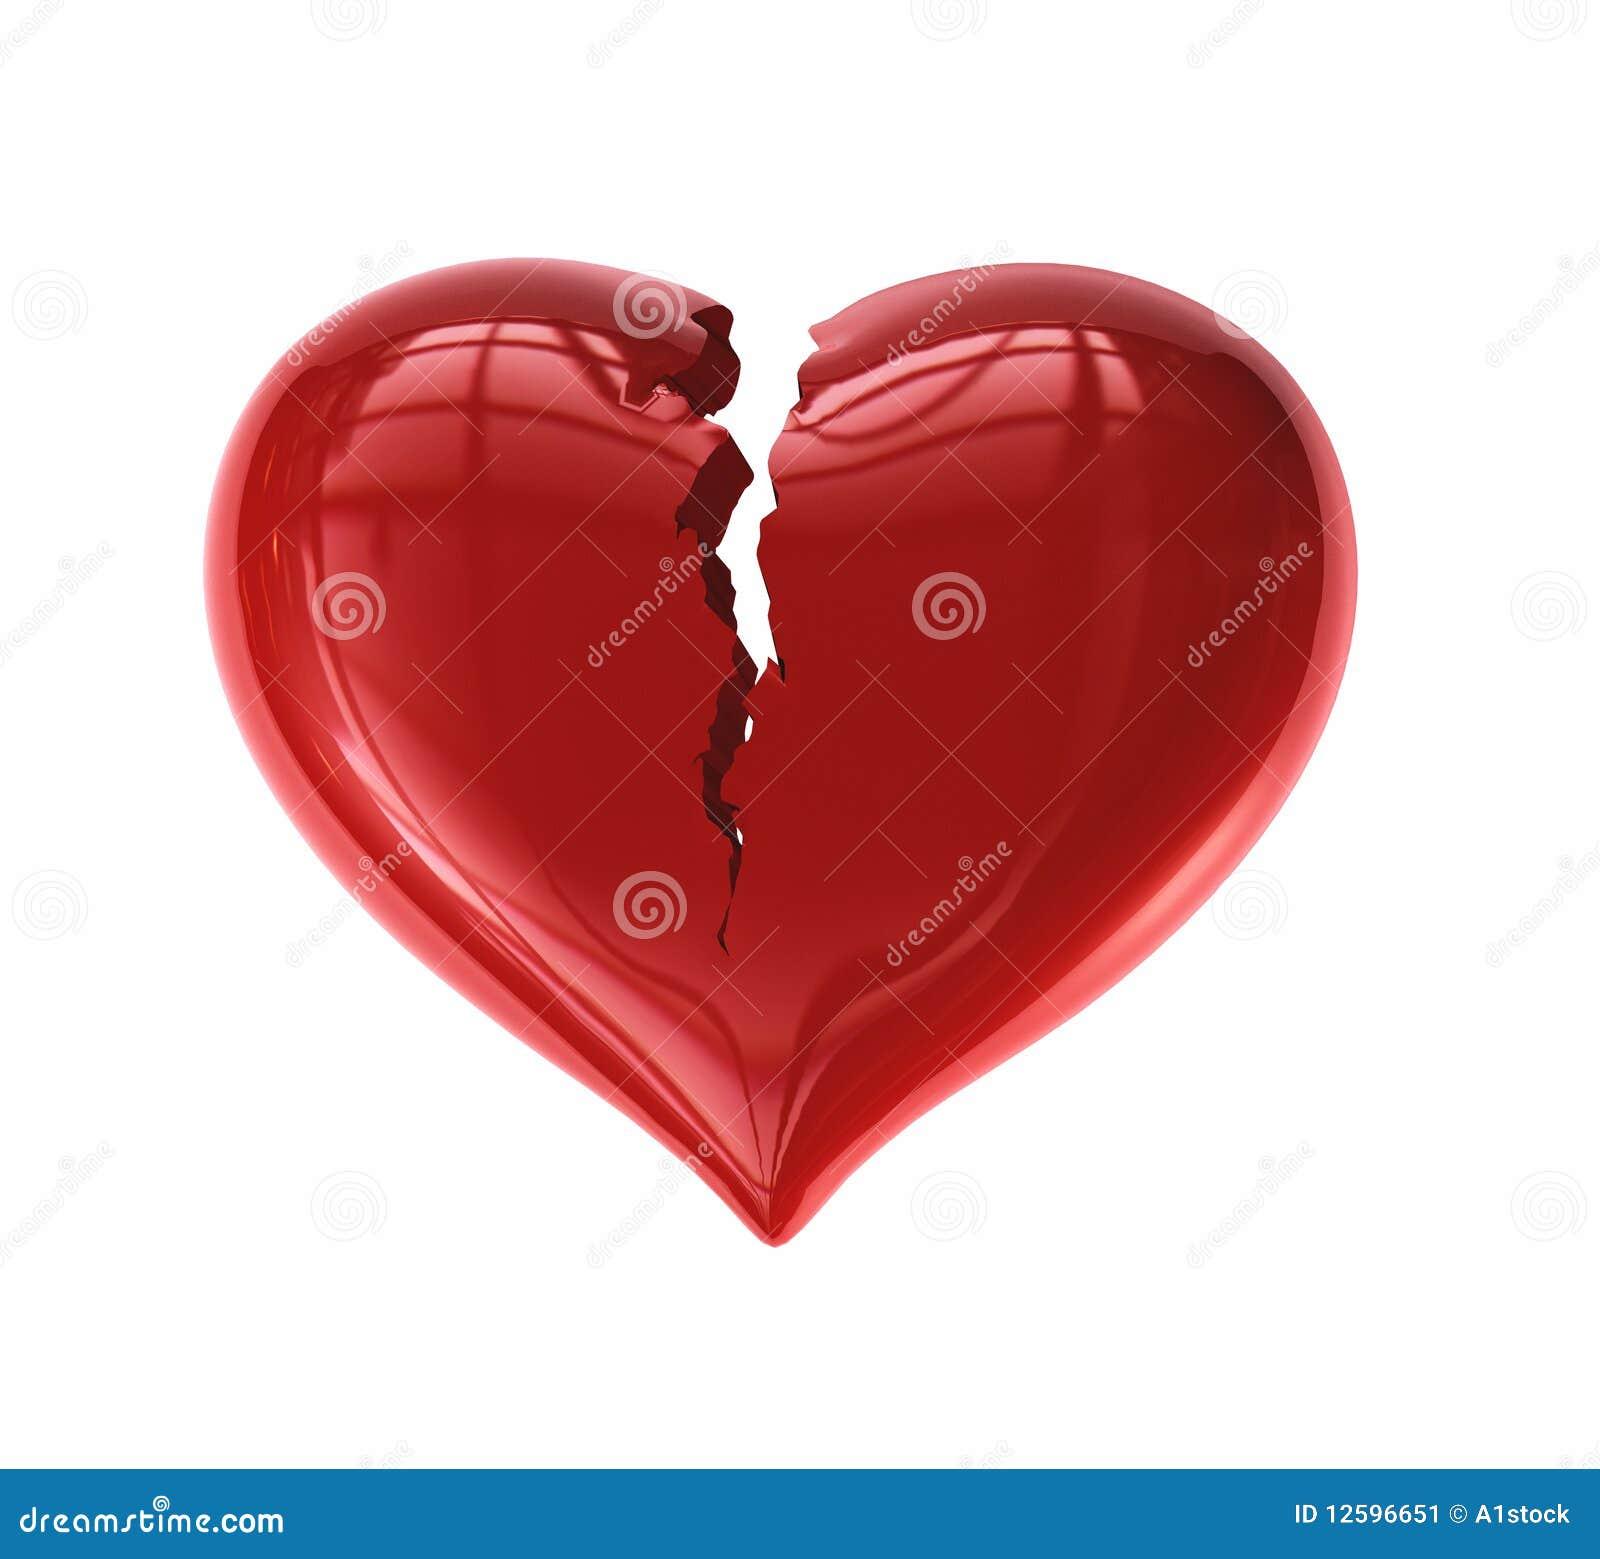 треснутое сердце